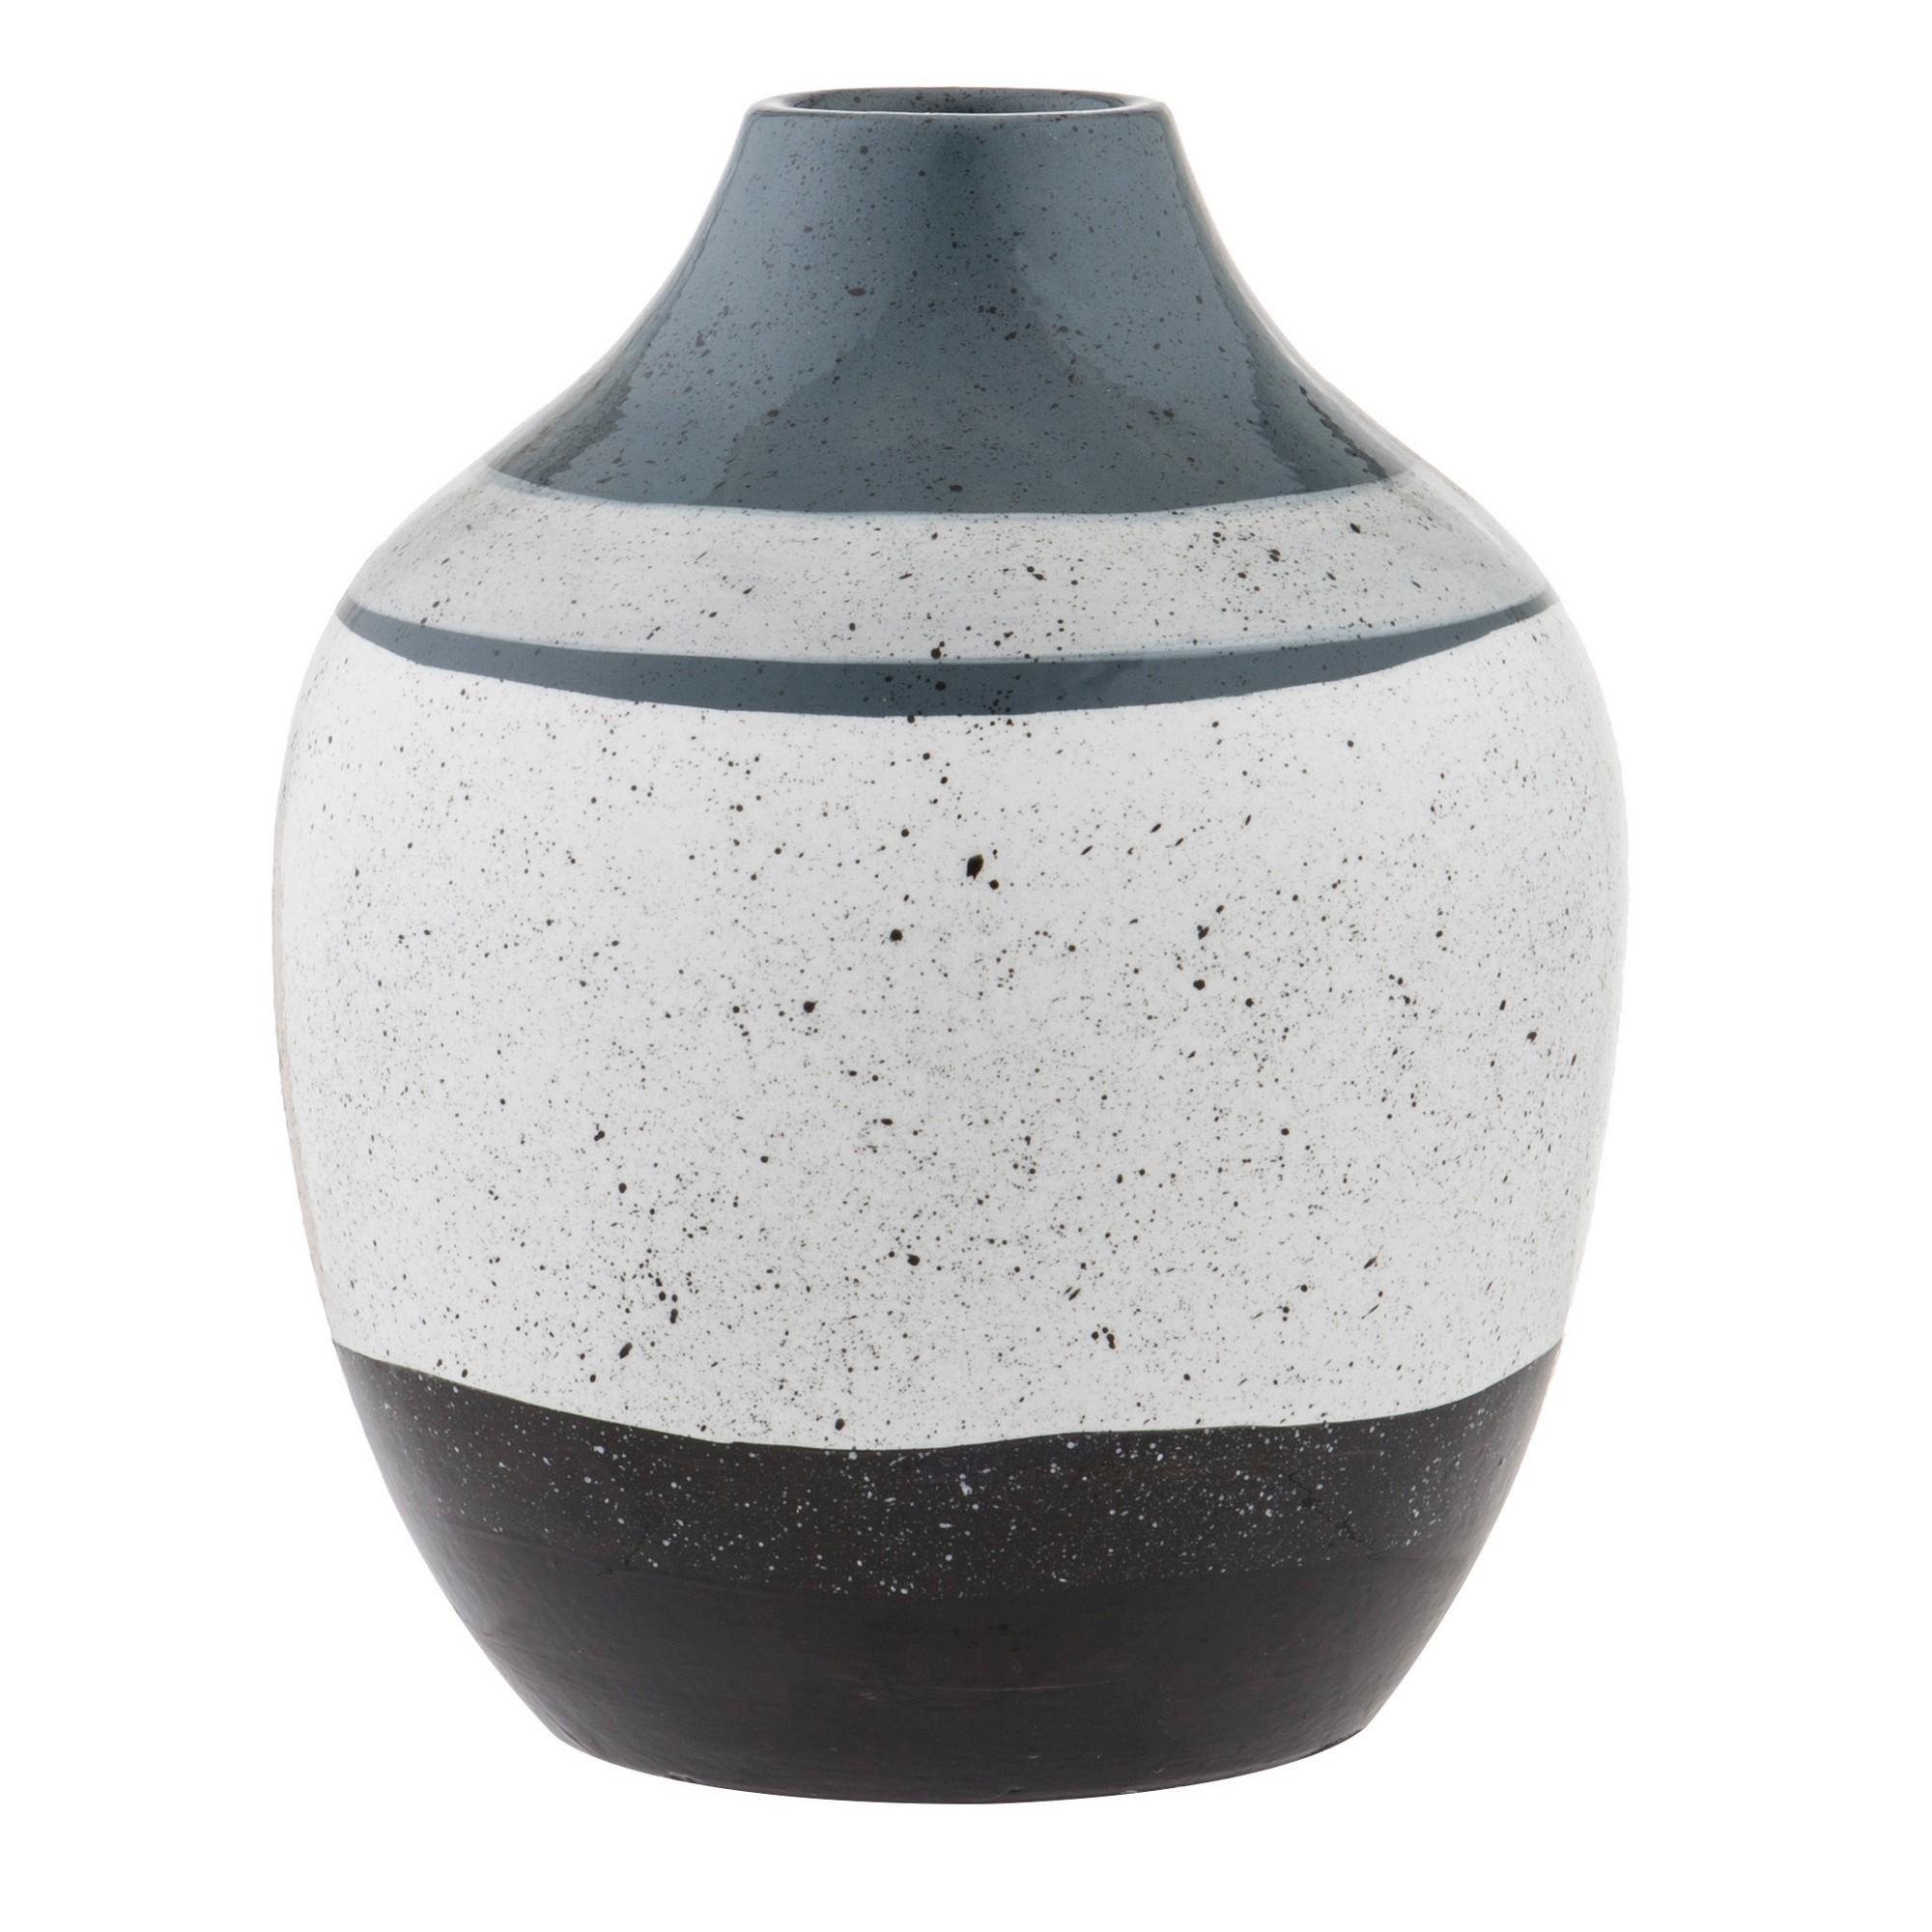 Ragna Ceramic Vase, Small, Blue / White / Black